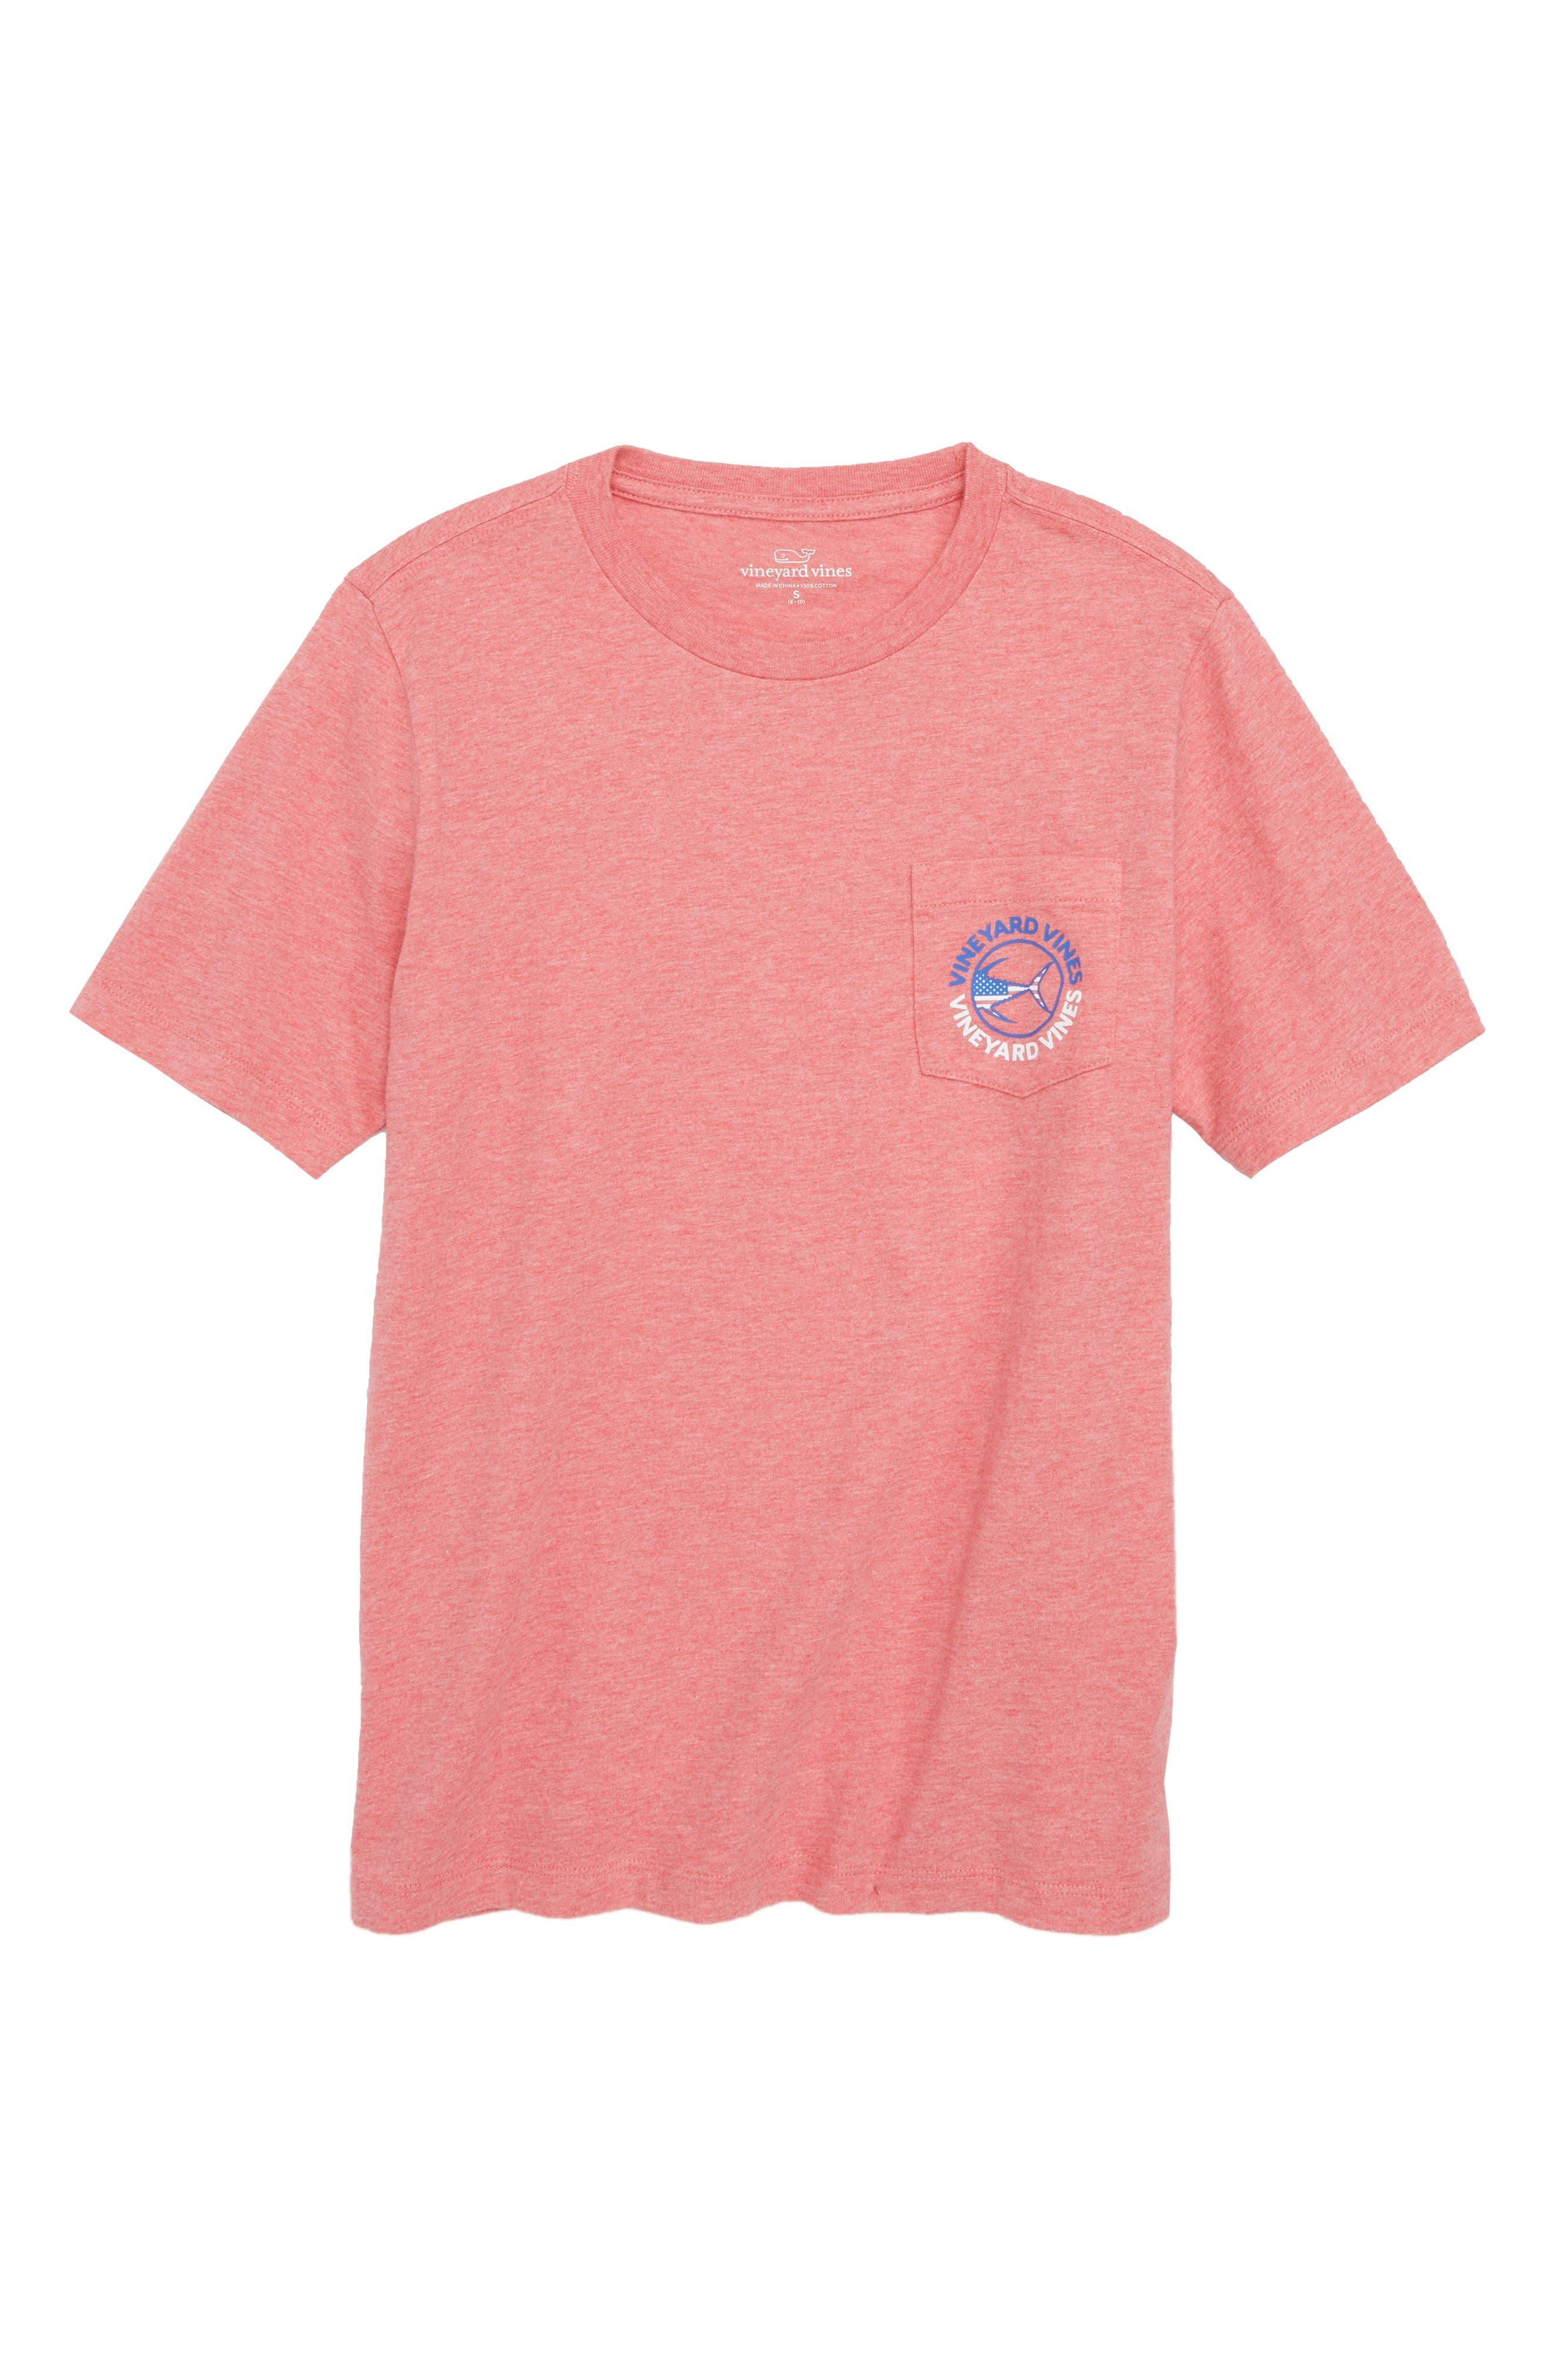 Tuna USA Pocket T-Shirt,                         Main,                         color, Jetty Red